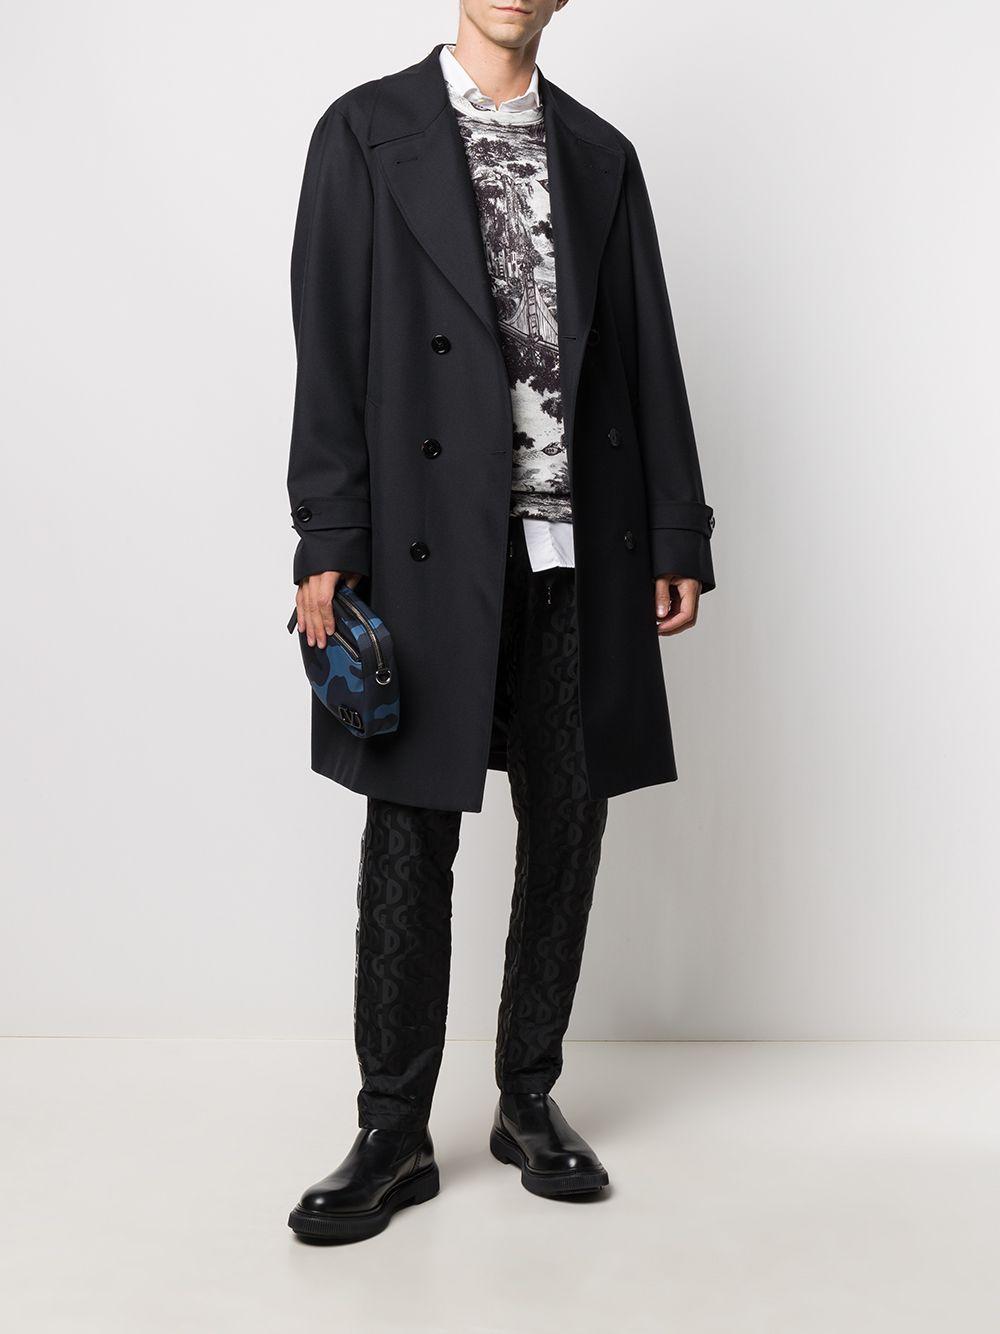 pantalone sportivo in nylon jacquard nero con logo DG all over DOLCE & GABBANA | Pantaloni | GWR1AT-FJSBDN0000